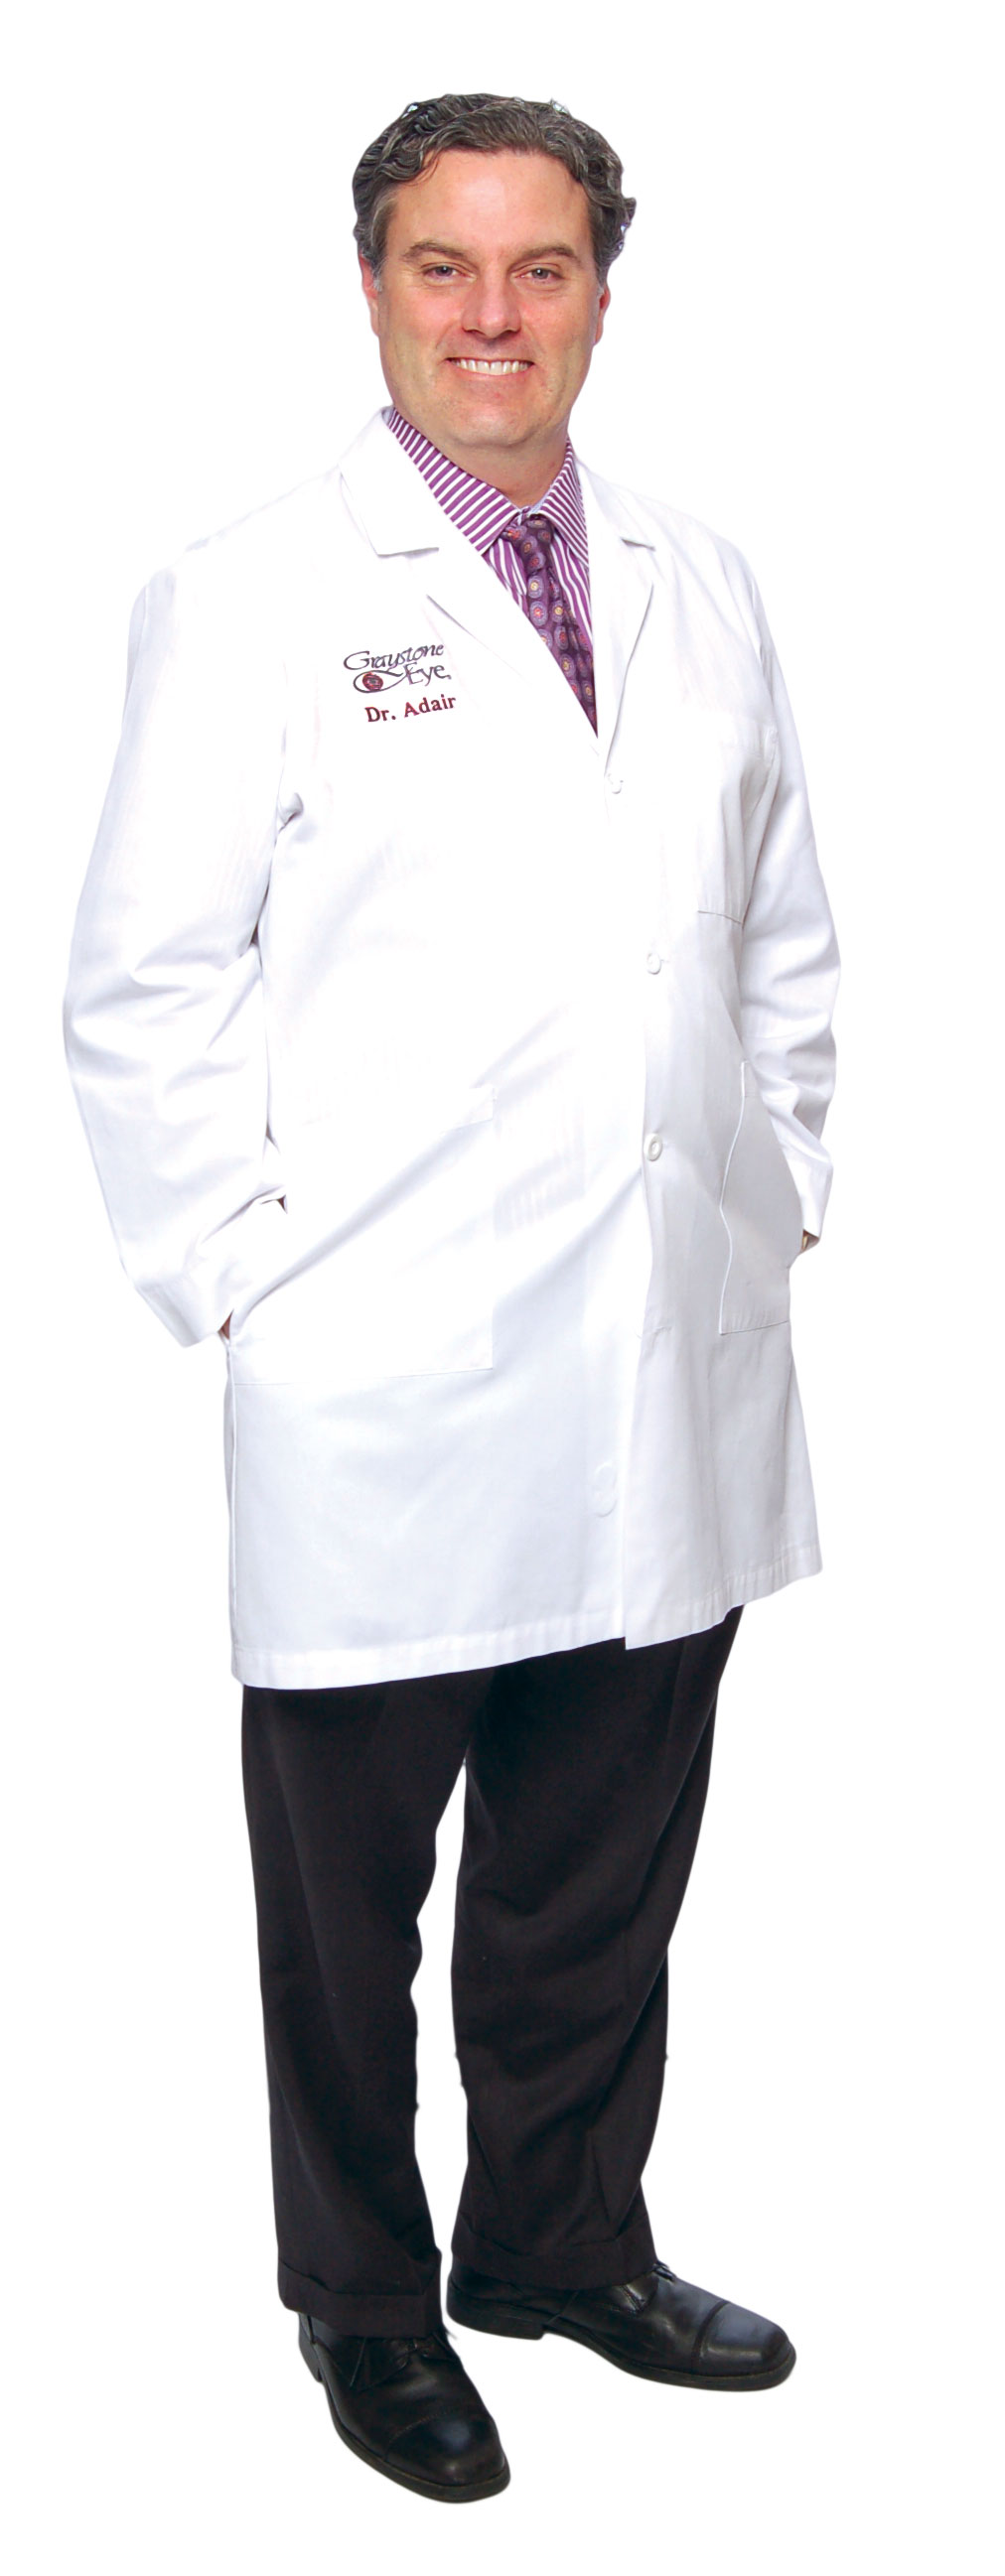 Dr. Brian C. Adair